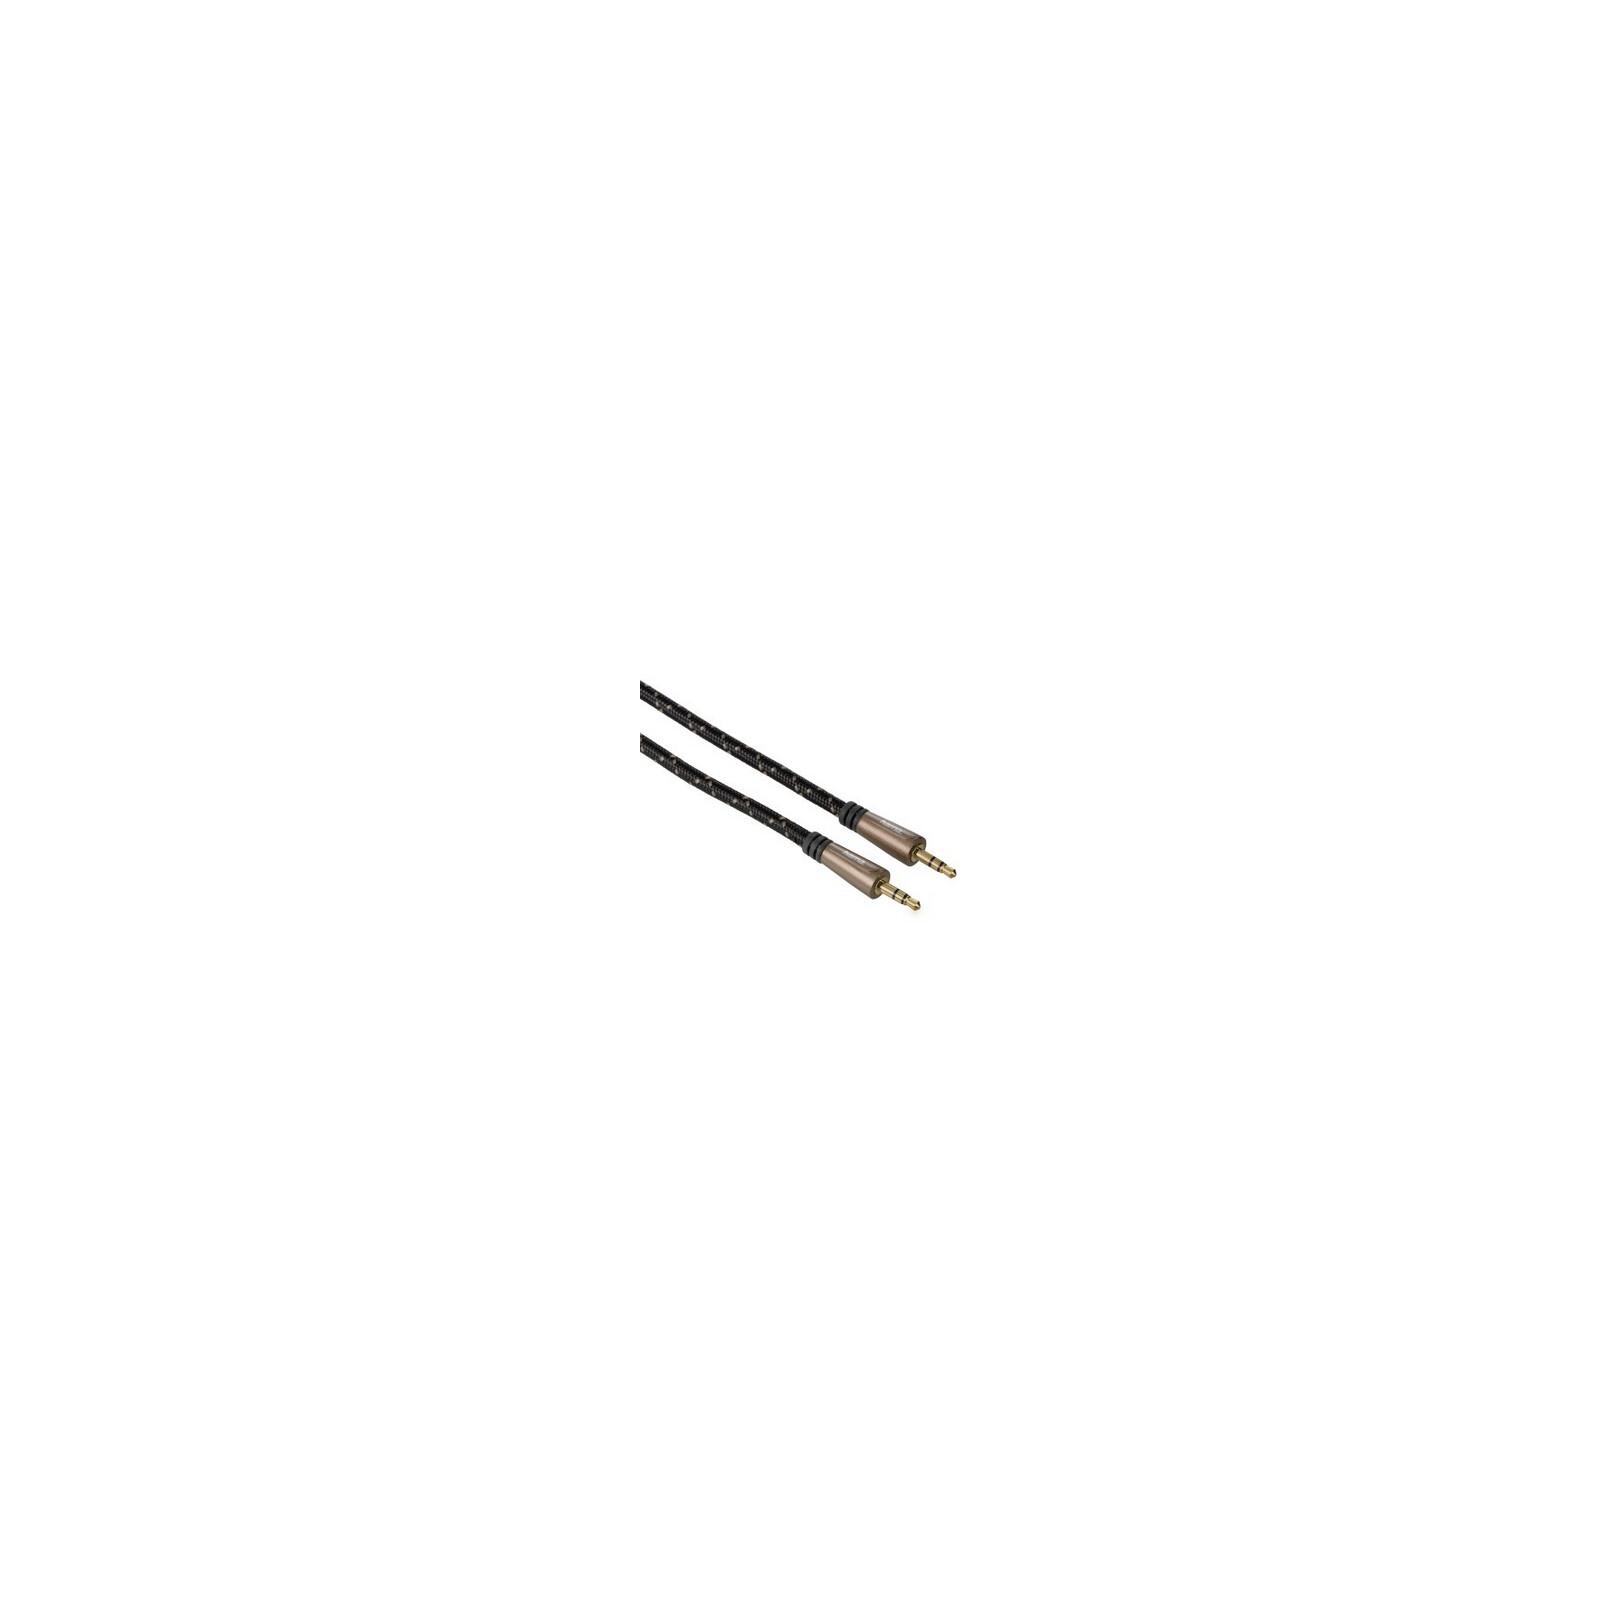 Hama 122328 Audio-Kabel 3,5-mm-Klinken-Stecker Metall 3m